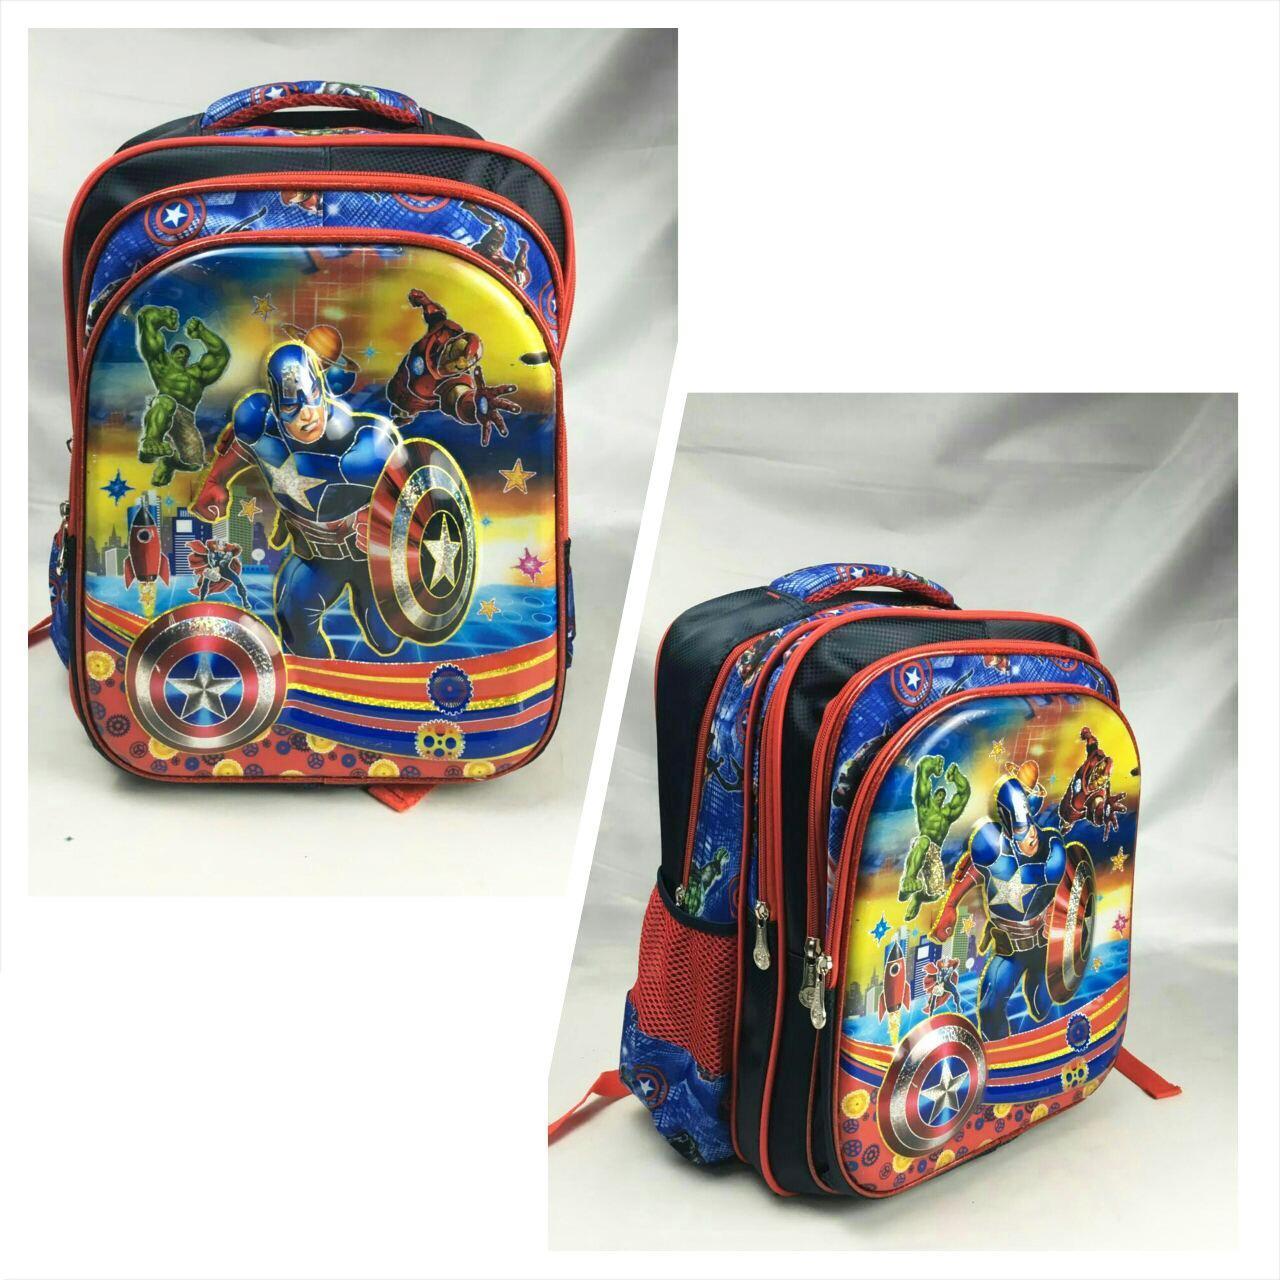 Ulasan Mengenai Onlan Tas Ransel Anak Sekolah Sd Motif Karakter Avengers Super Hero 5D Timbul Kantung Besar Import